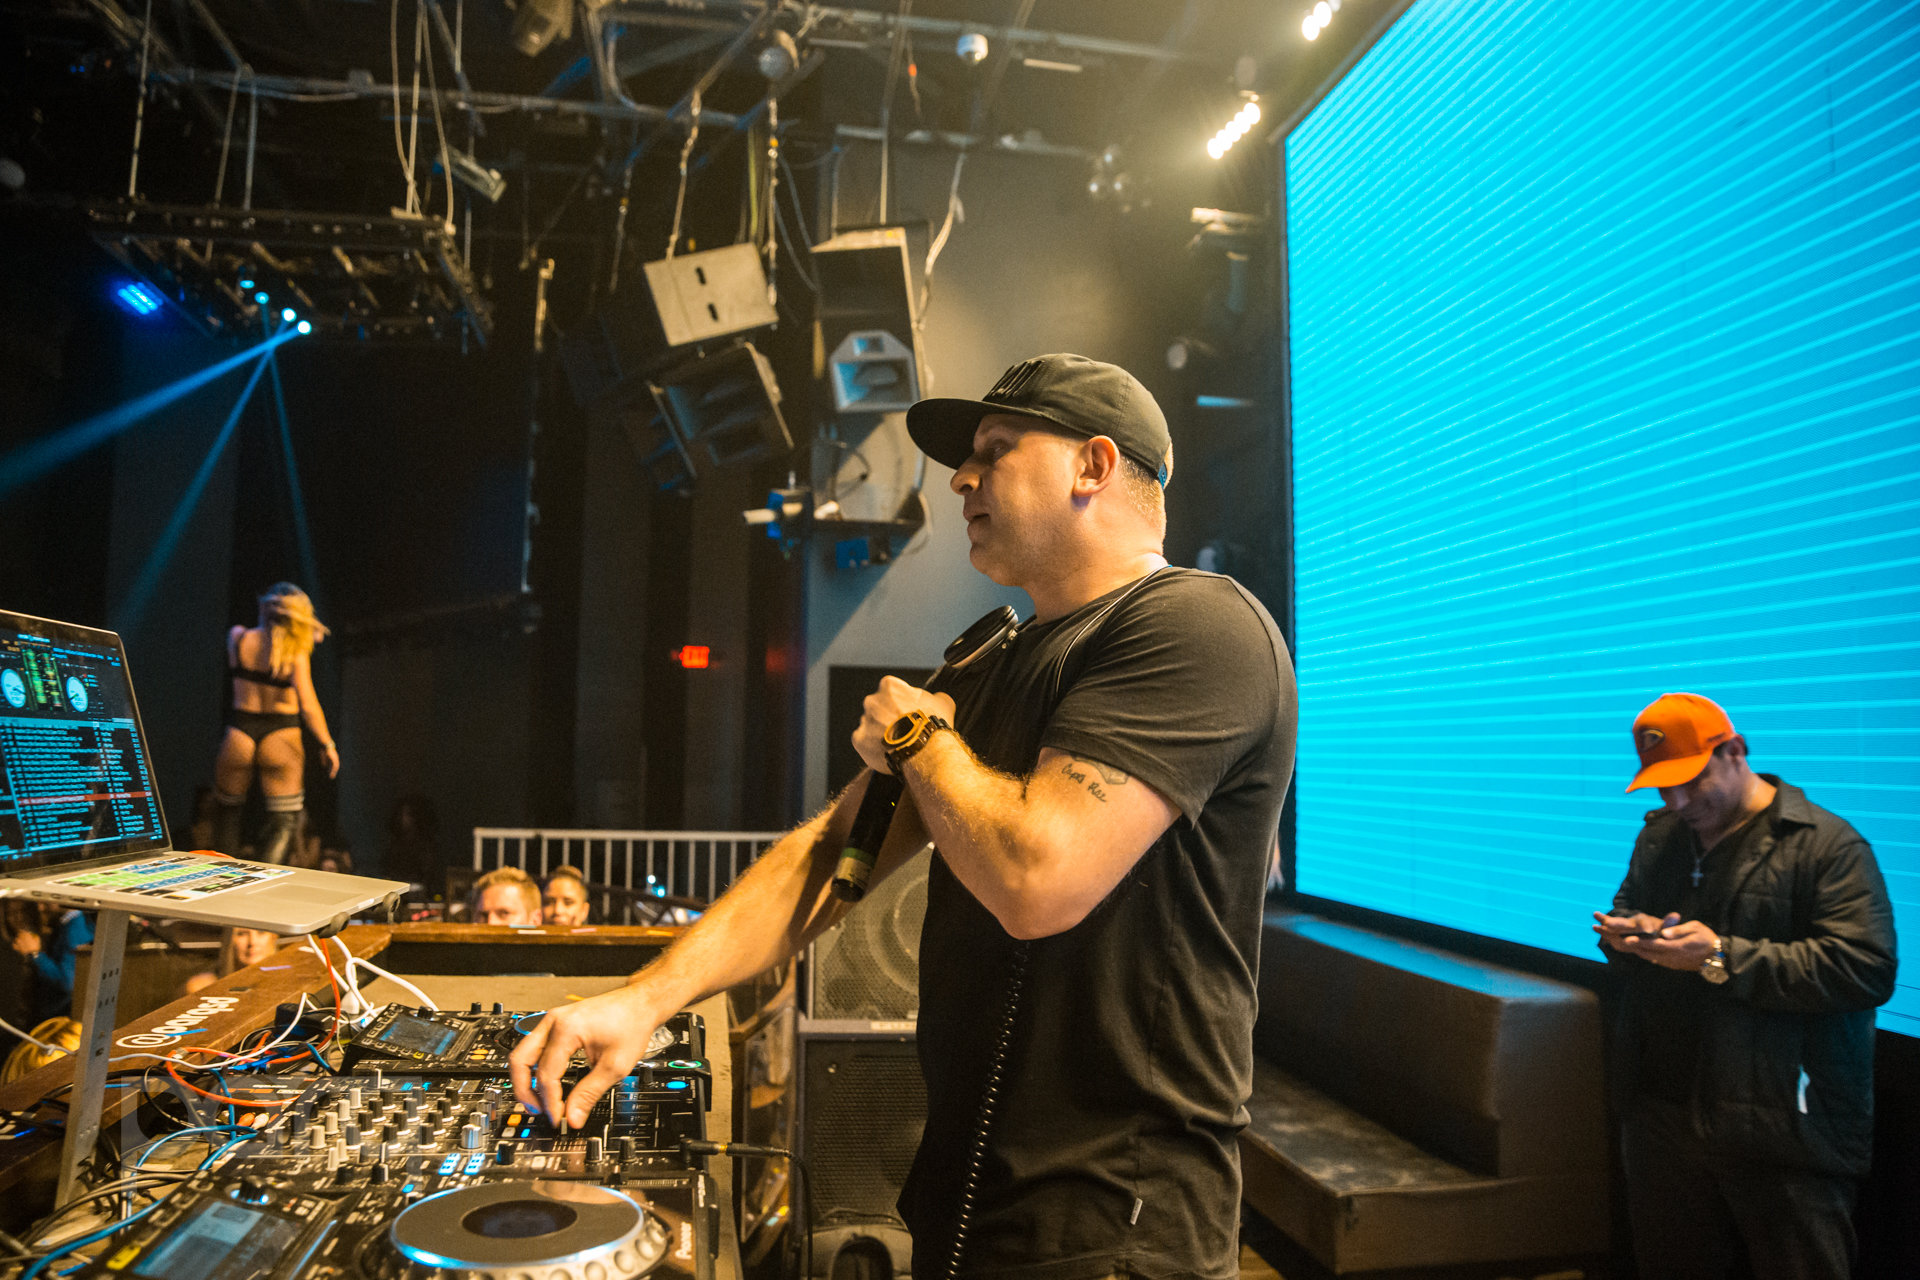 01.19.18 Parq - DJ Hollywood-3.jpg